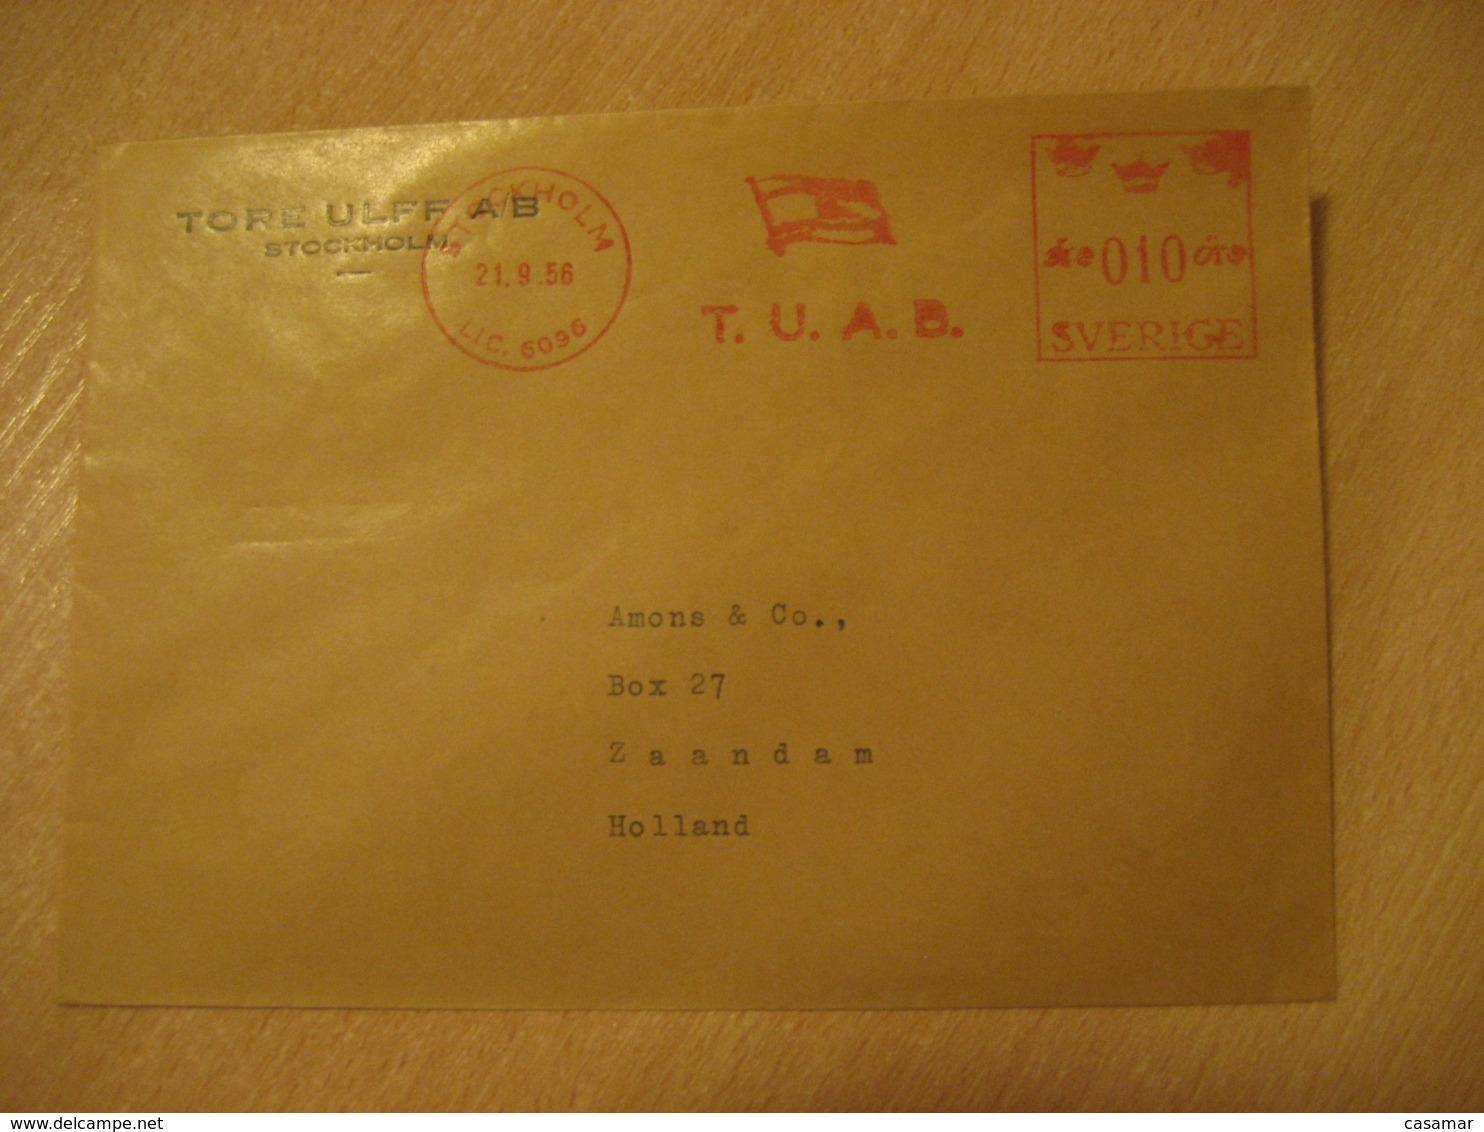 STOCKHOLM 1956 To Zaandam Holland T.U.A.B. Meter Mail Cancel Cover SWEDEN - Briefe